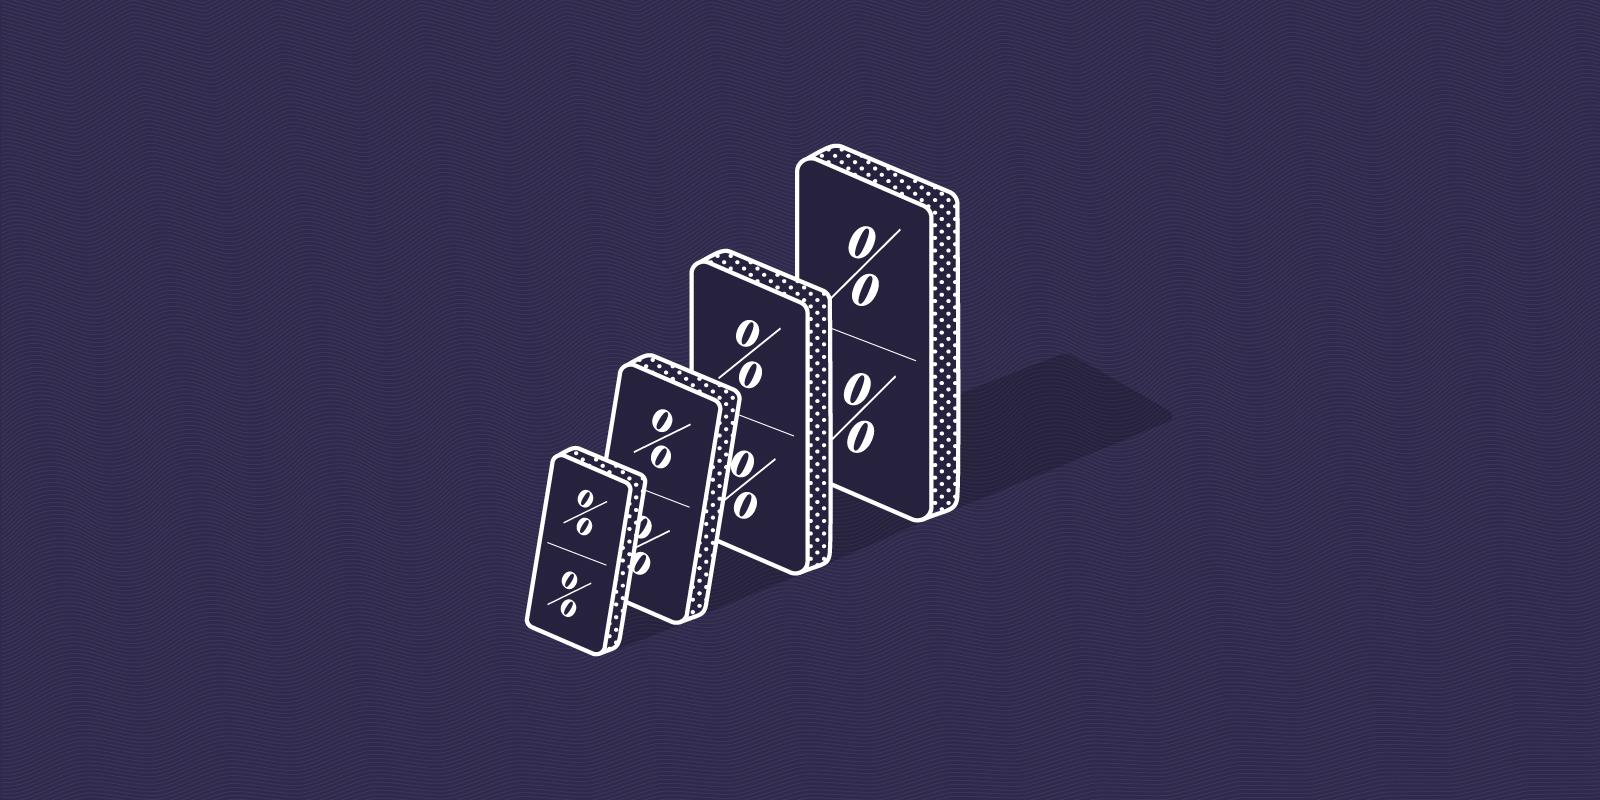 Renters rente – din investerings bedste ven